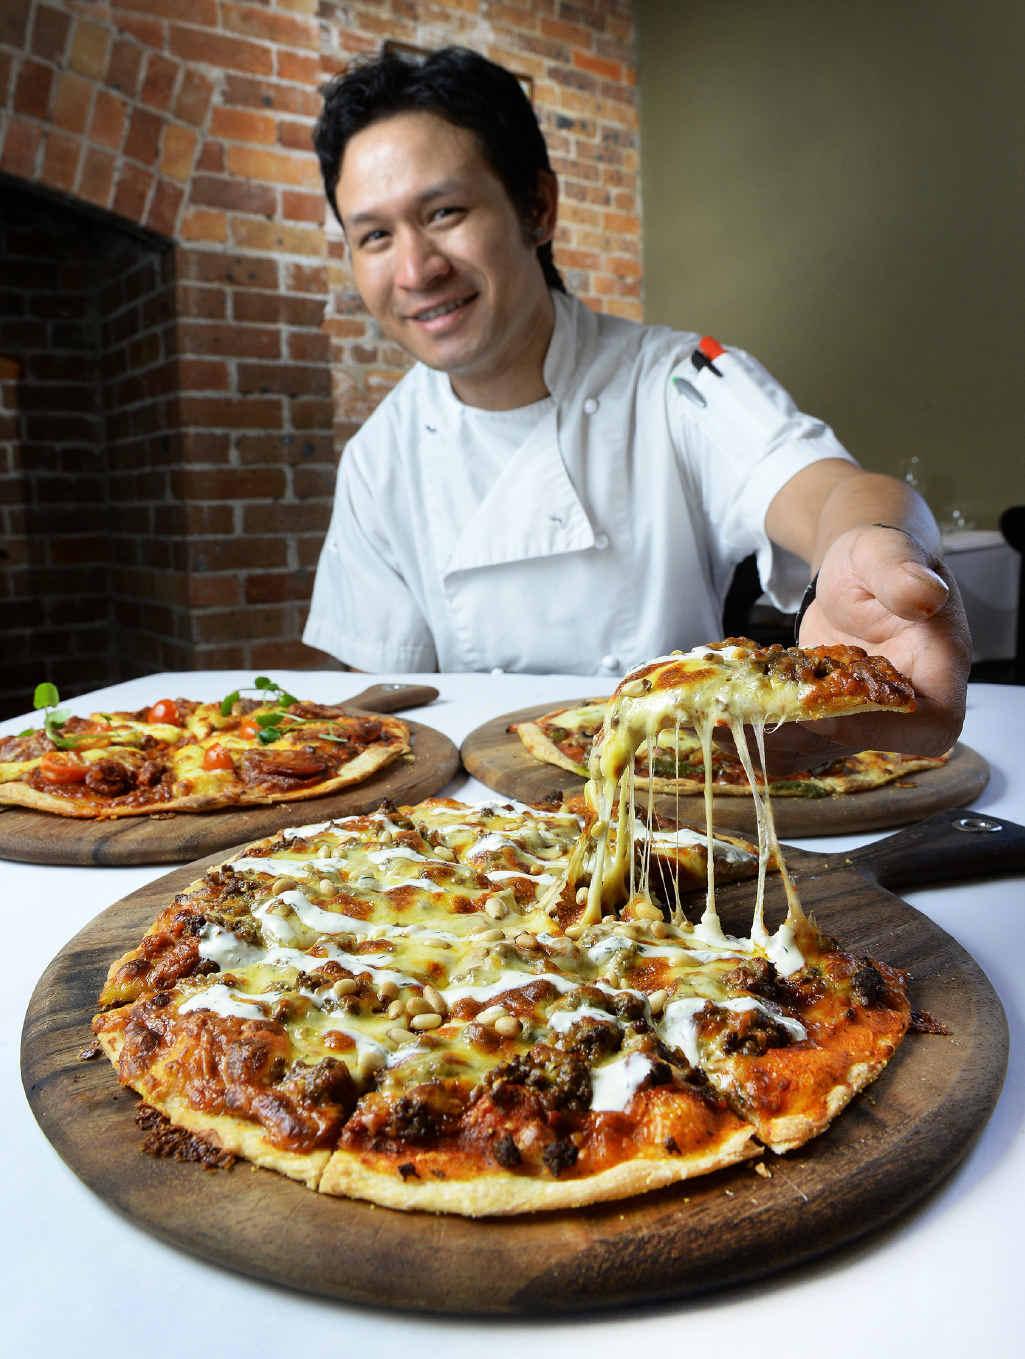 ITALIAN INSPIRED: Head chef Sudesh Shretha helped create the new range of pizzas at Stumps.